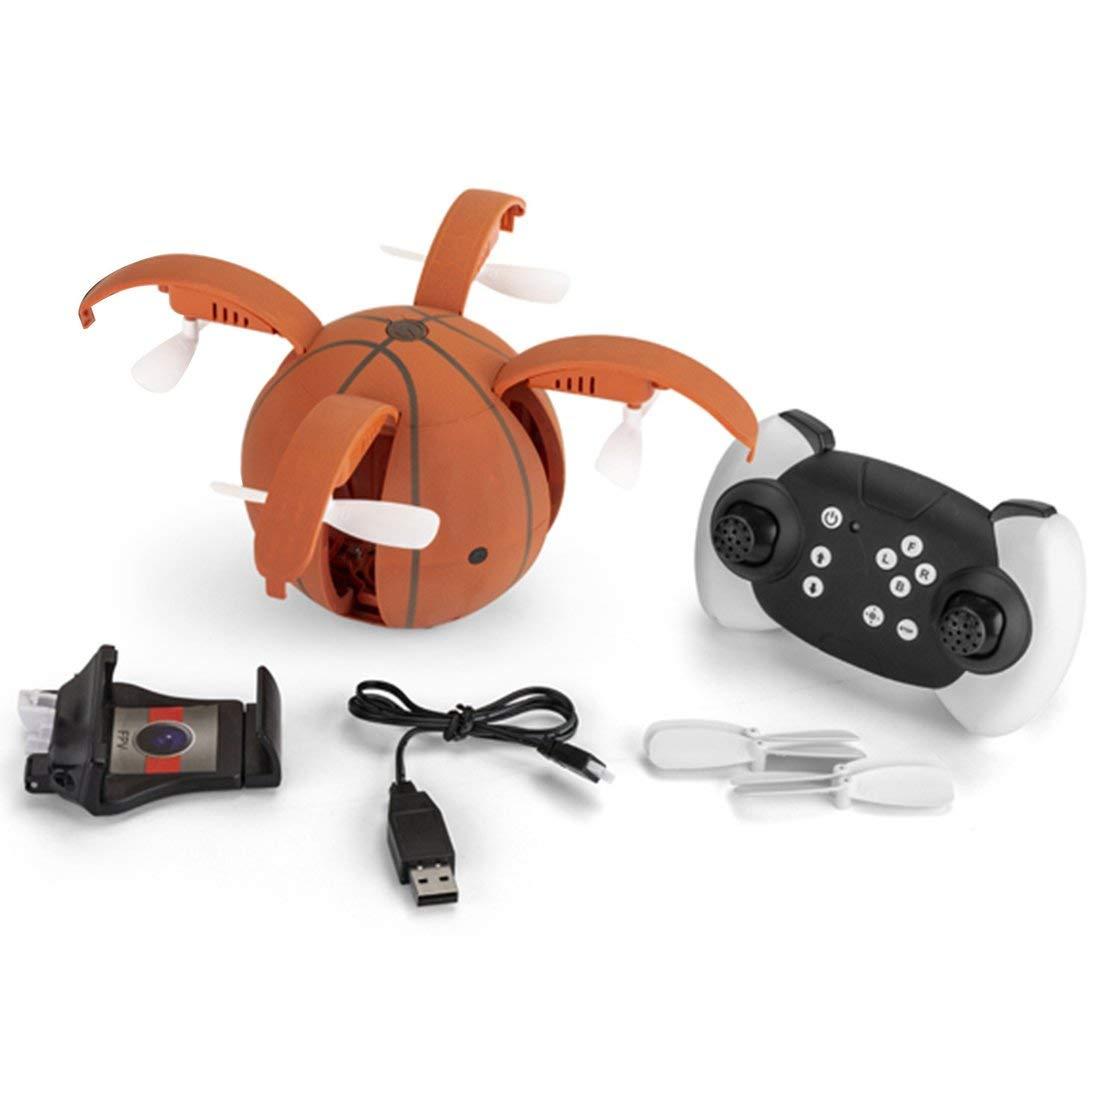 X45-1 RC Drohne Kamera 720 P 2,4 GHz WiFi FPV Faltbarer Basketball Flugzeug Höhenstand Headless Modus G-Sensor Quadcopter Flugzeuge